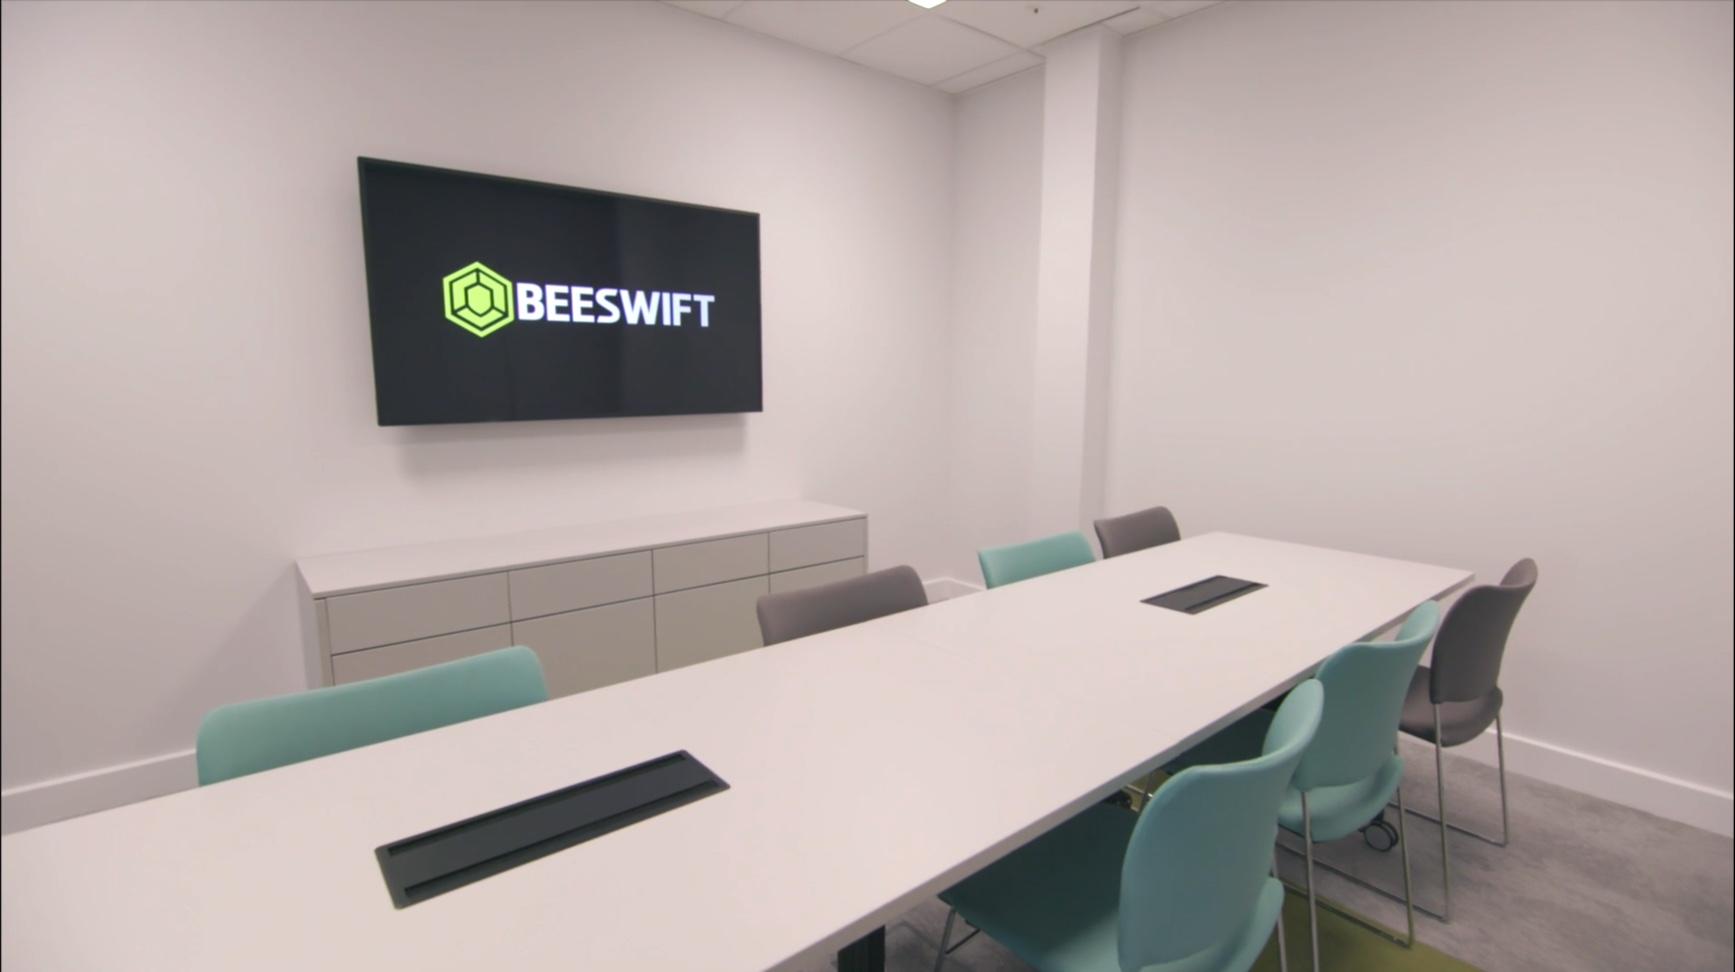 Beeswift promo video